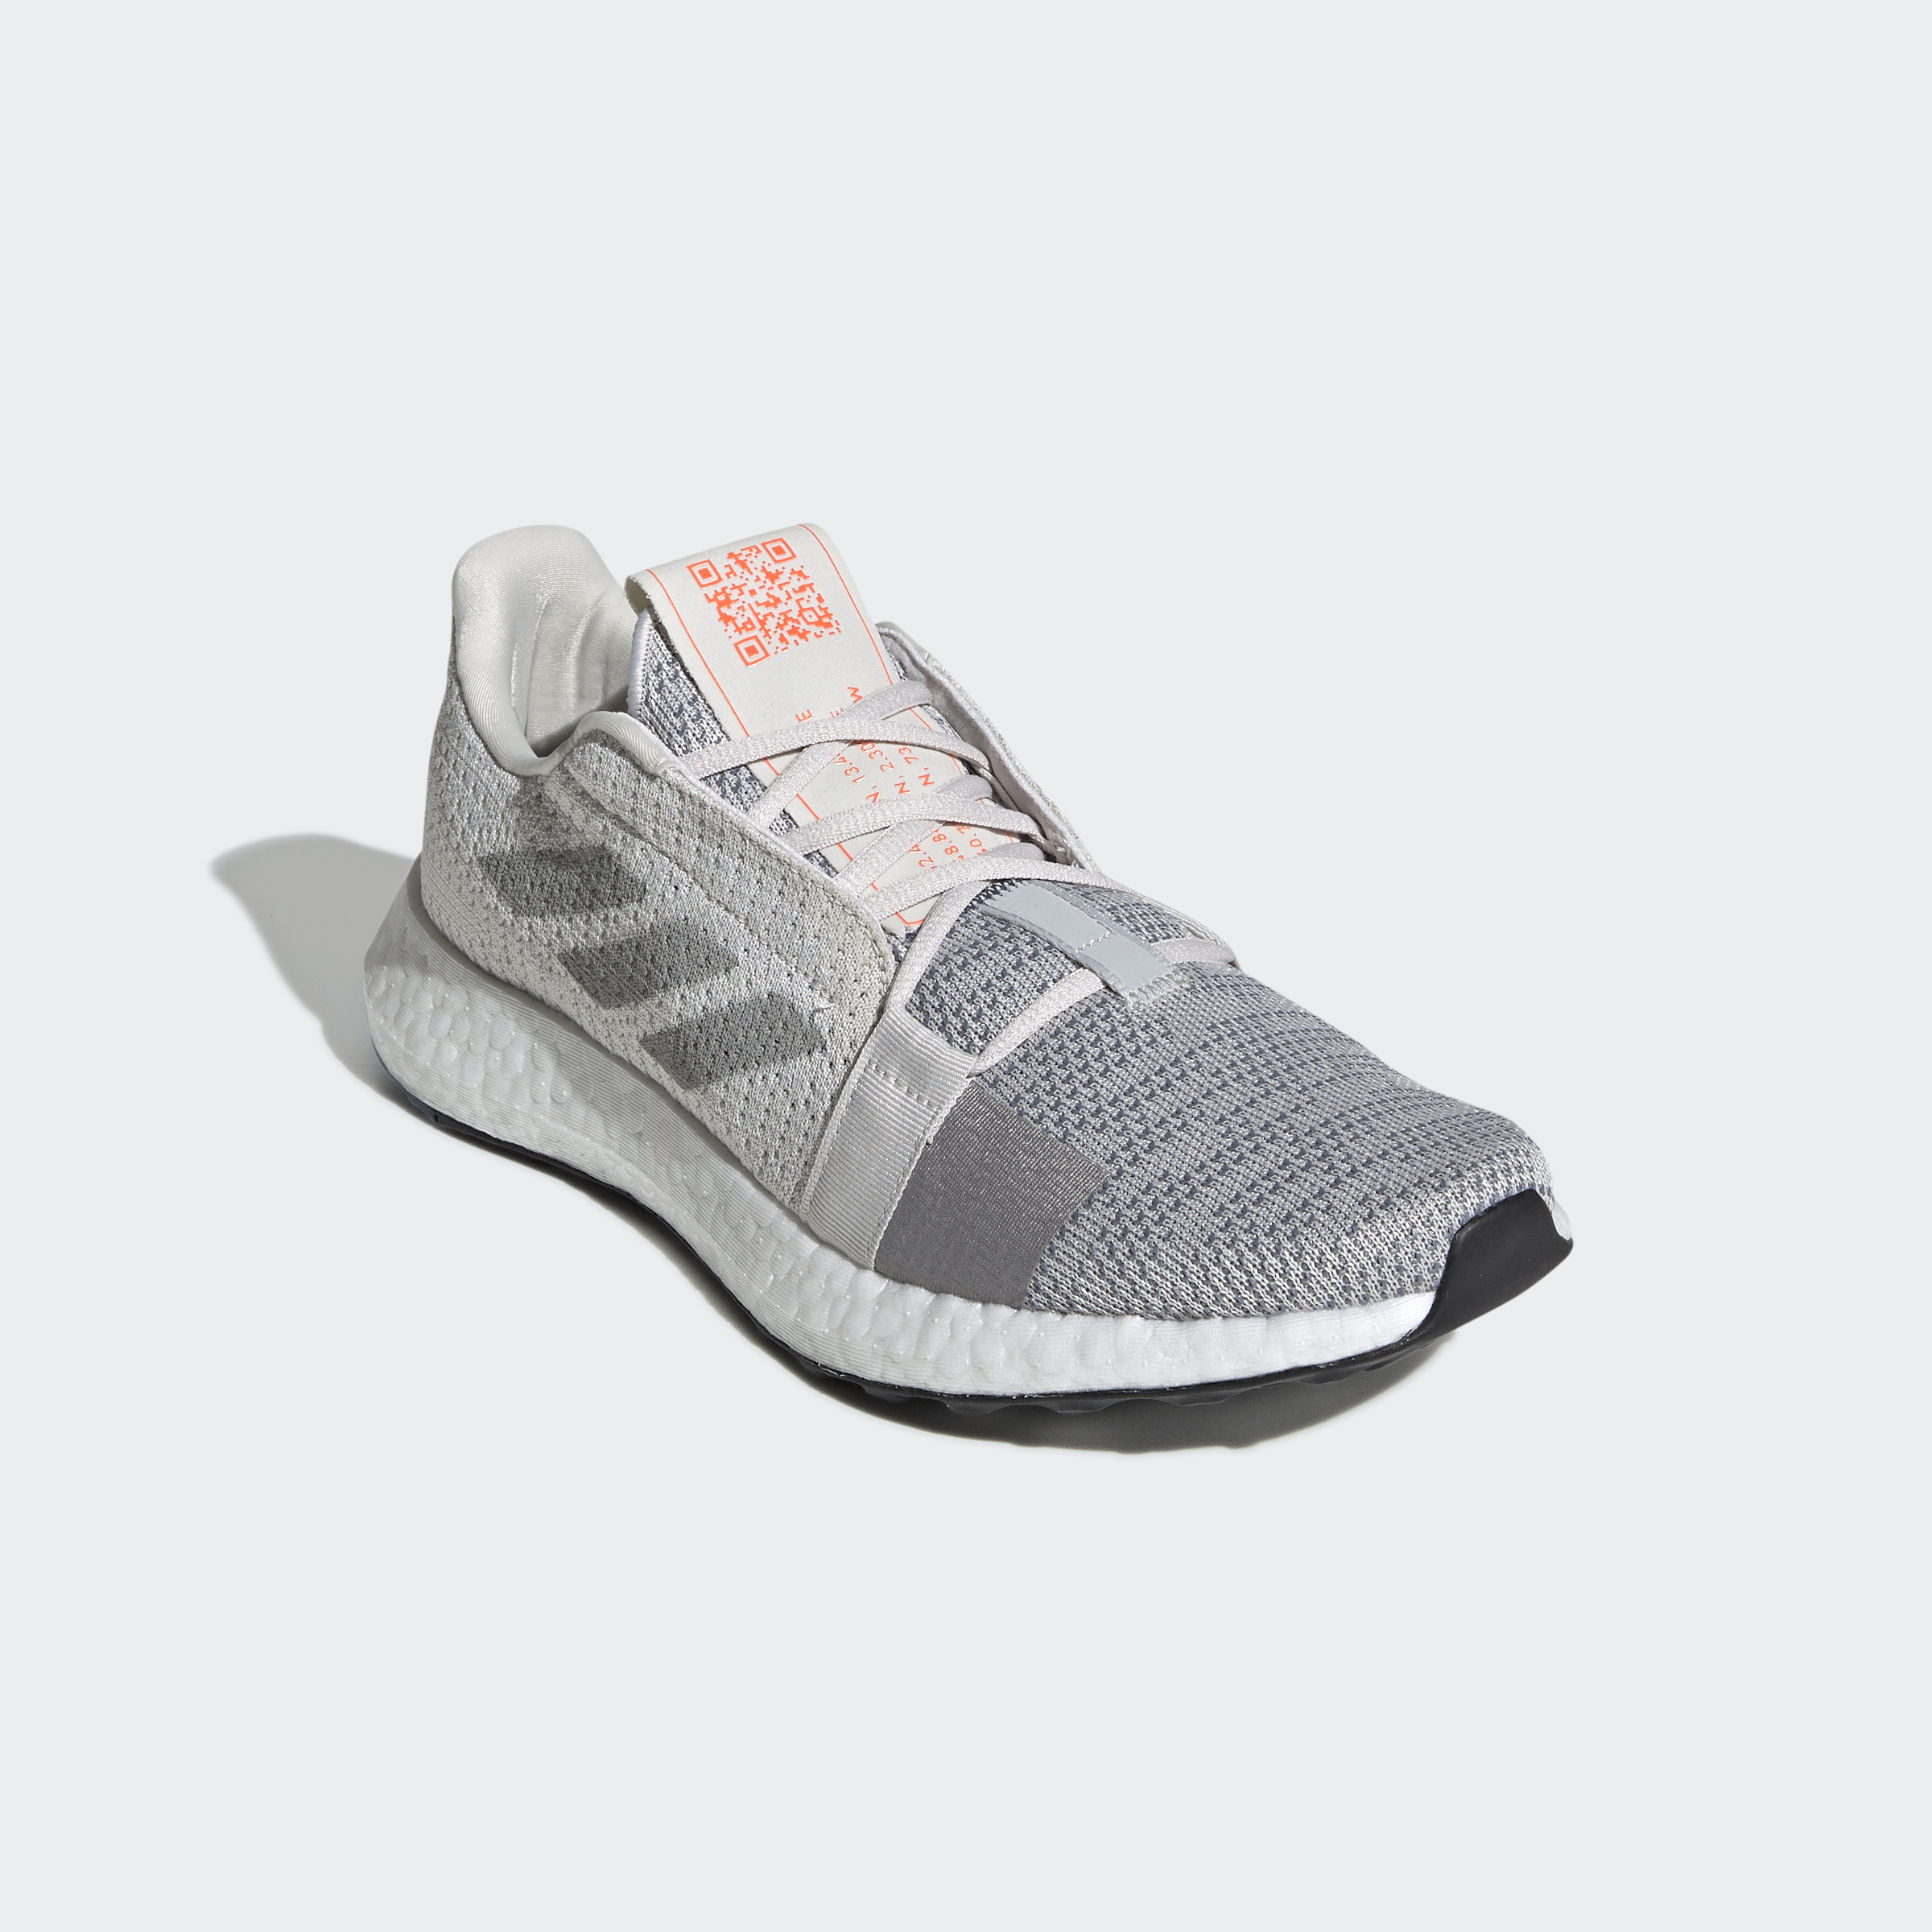 miniature 51 - adidas Senseboost Go Shoes Men's Athletic & Sneakers